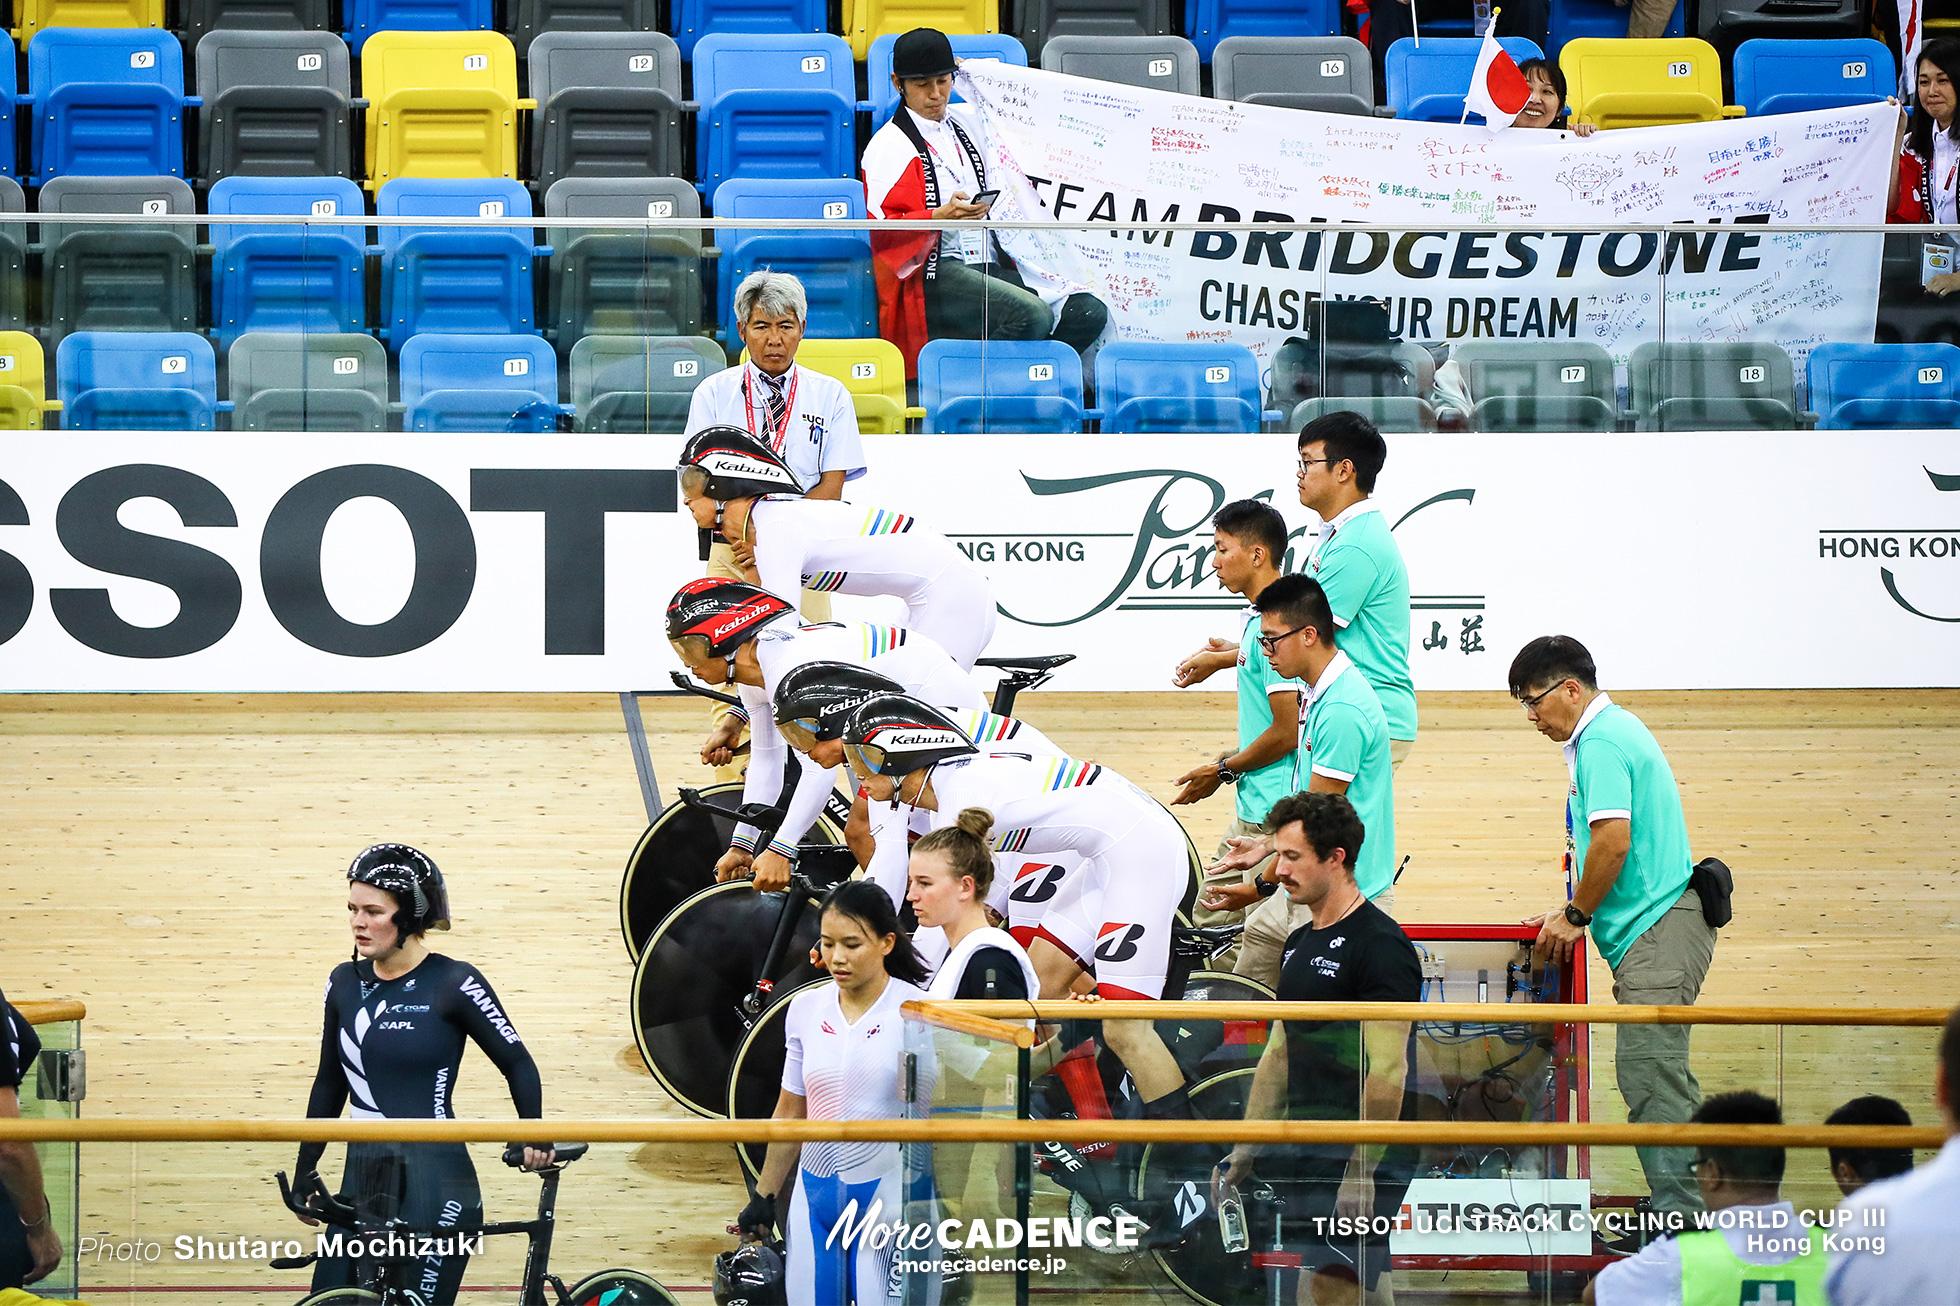 1st Round / Men's Team Pursuit / TISSOT UCI TRACK CYCLING WORLD CUP III, Hong Kong, 今村駿介 窪木一茂 近谷涼 沢田桂太郎